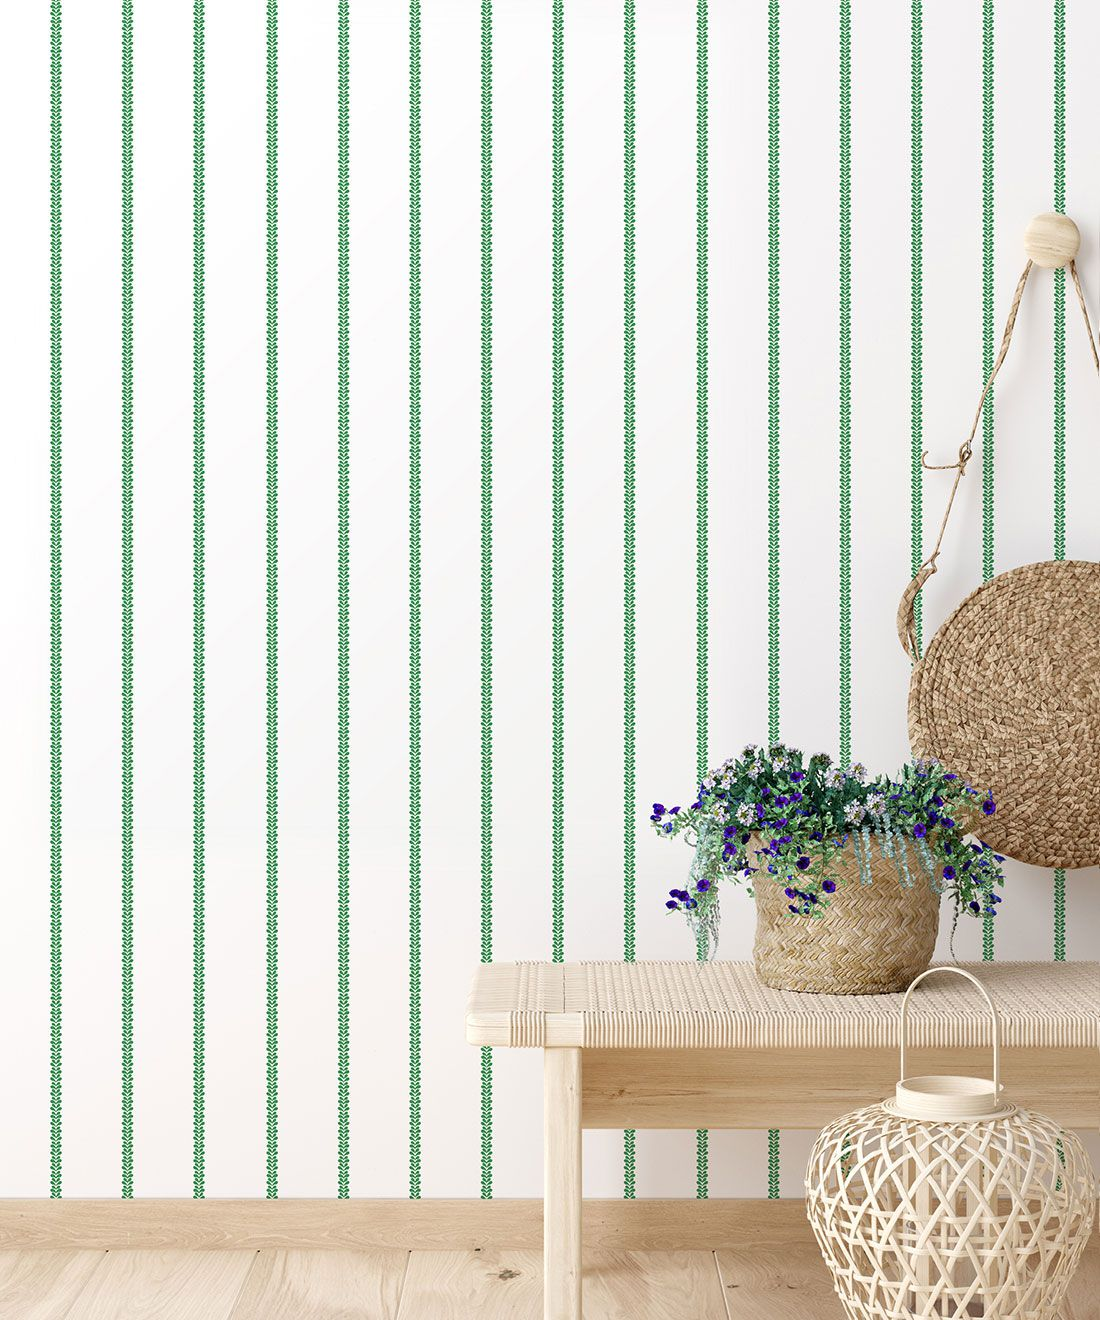 Chemin Wallpaper • Striped Wallpaper • Forest Green • Insitu